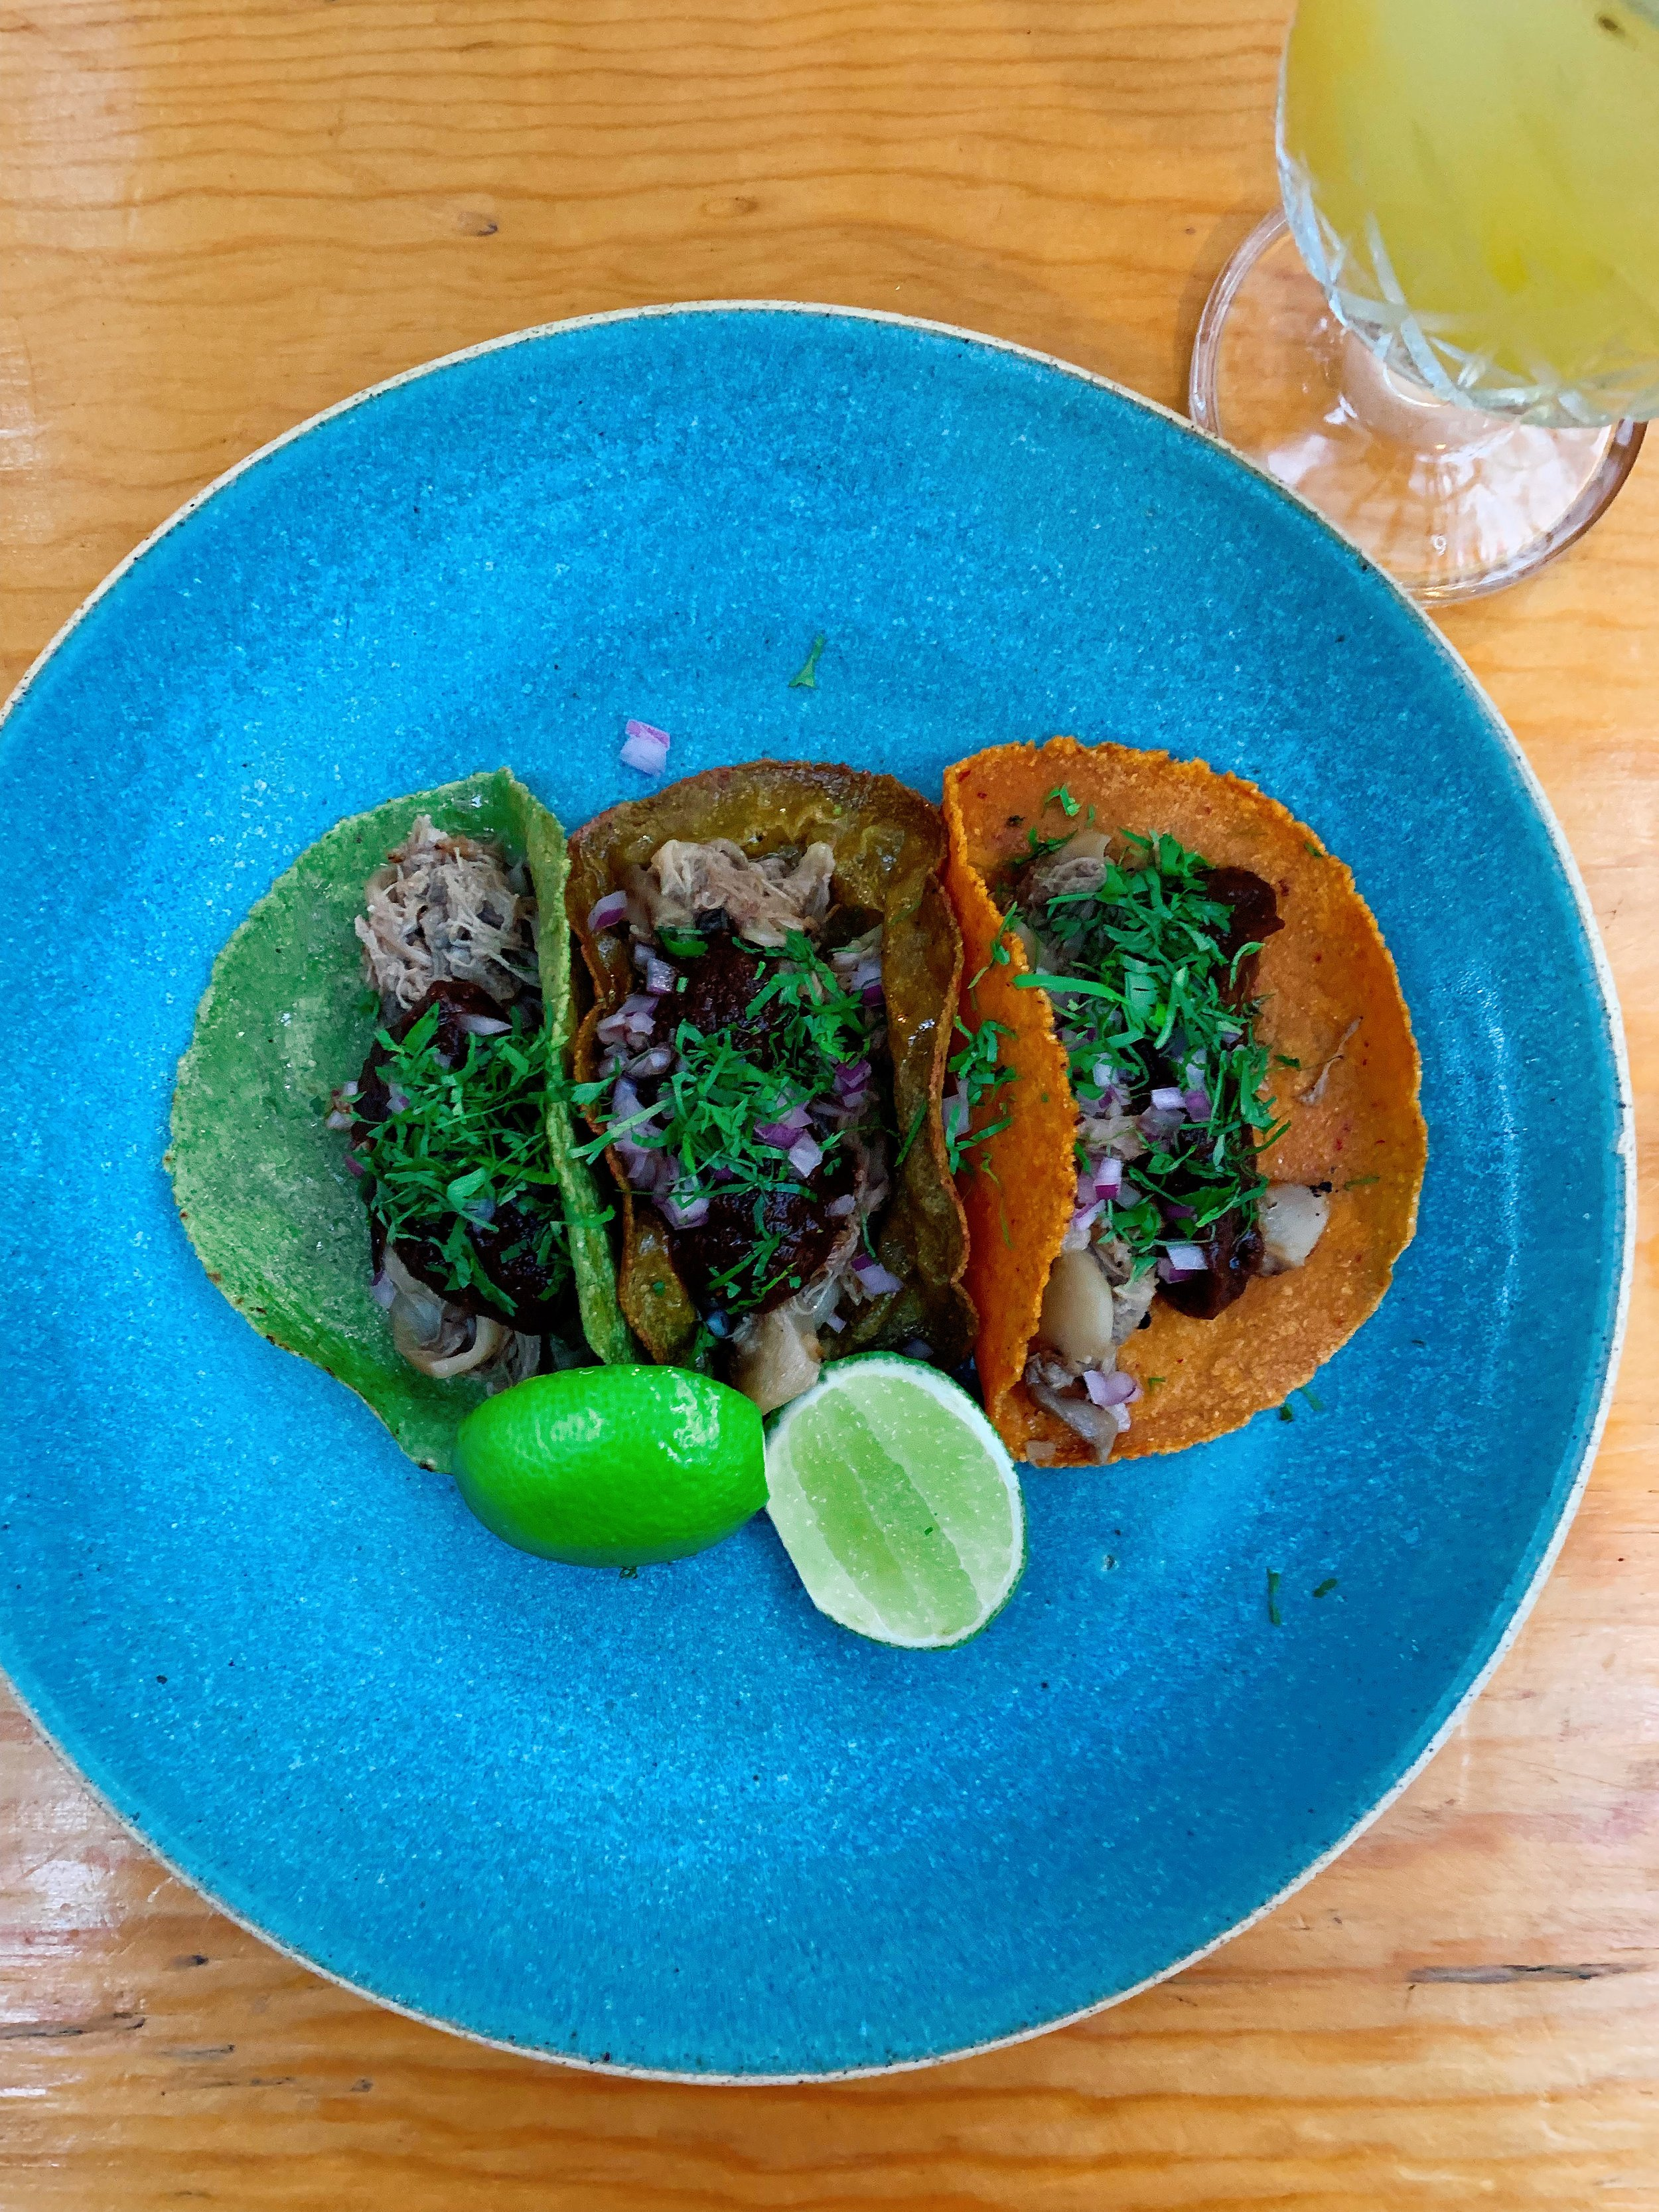 Duck Carnitas And Mushrooms | Handmade Tortilla With Pasilla Chili Sauce + Purple Onion + Coriander